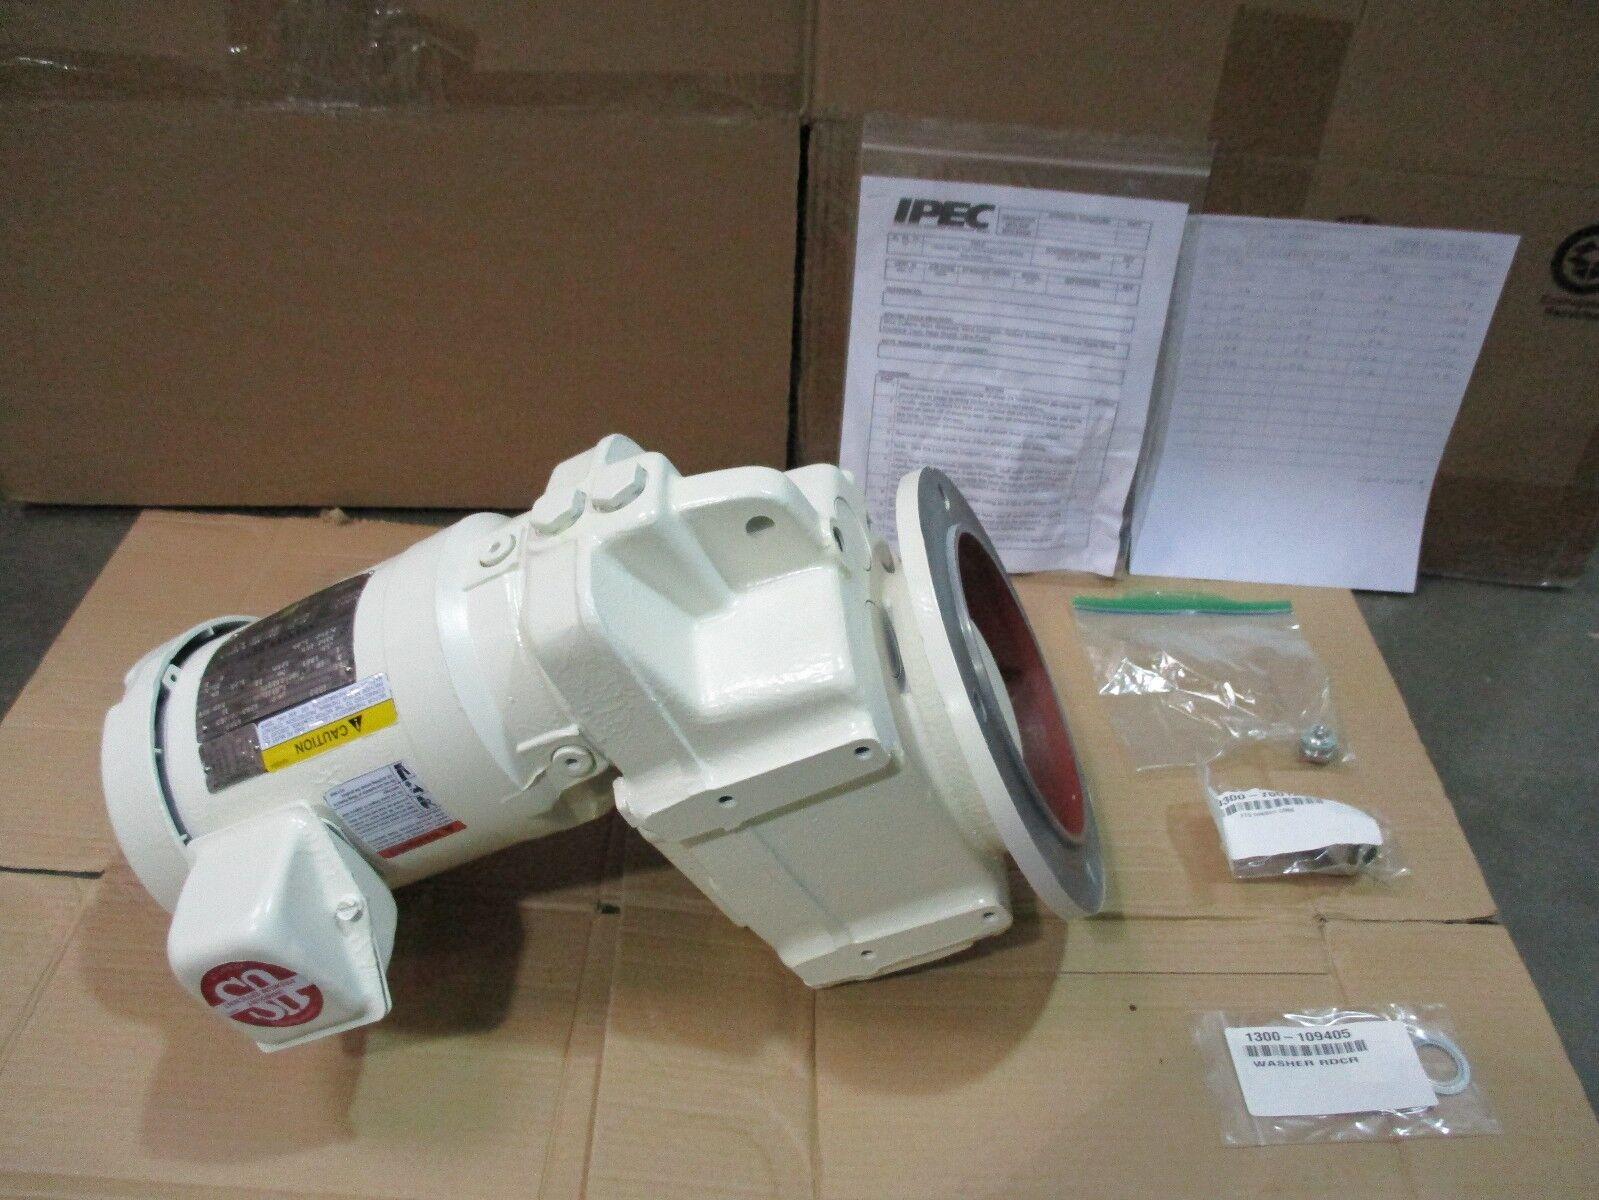 Emerson 6592 Motor & Gear Box, Inverter, Ipec Speedfam Novellus, .50 HP, 420707